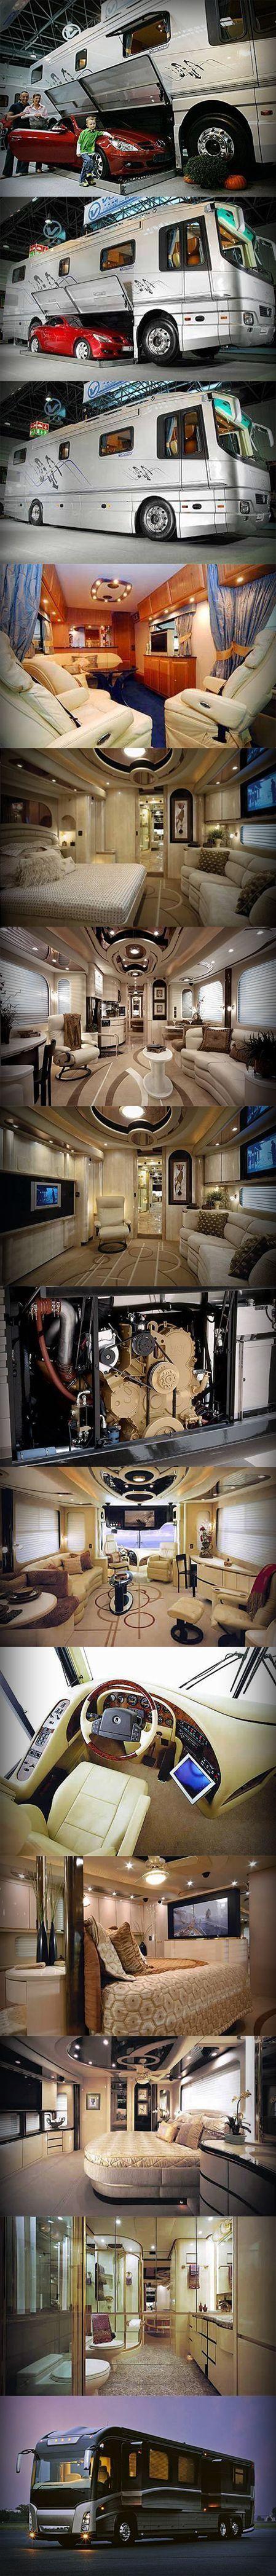 luxury rv prices 15 best photos luxury-rv-prices-15-best-photos-7